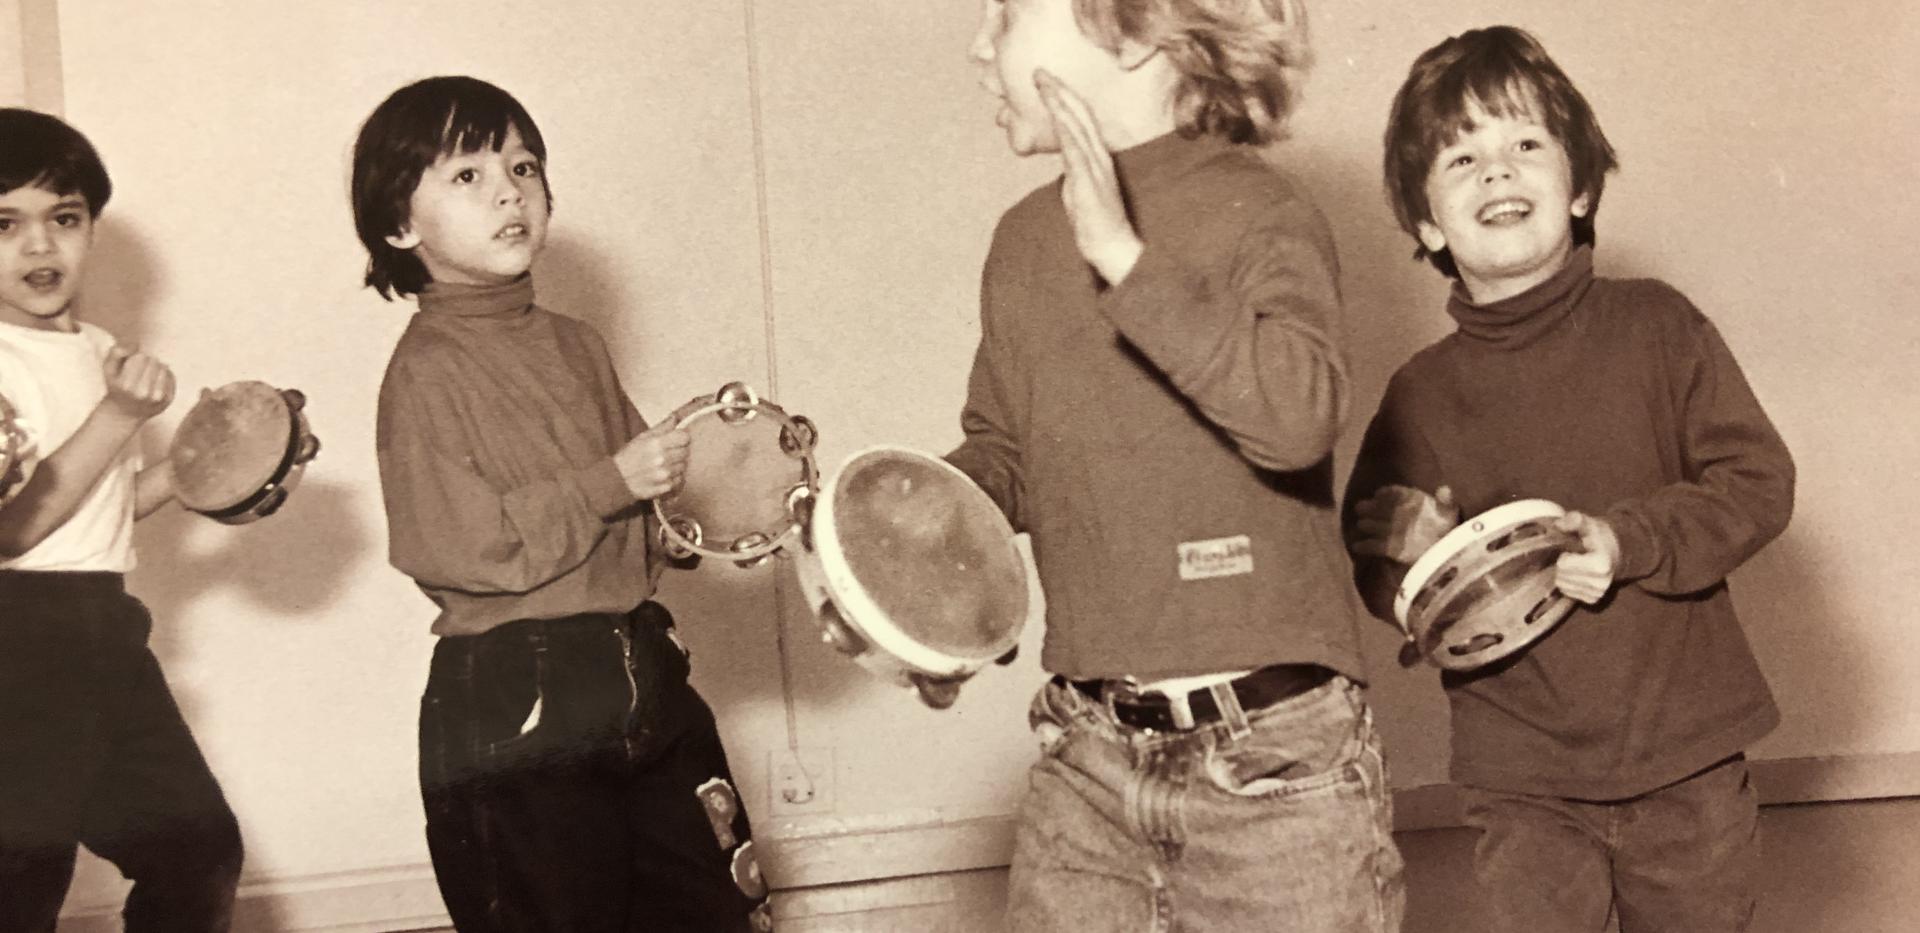 Dalcroze Eurhythmics class at 311 Church Street, early 1990s